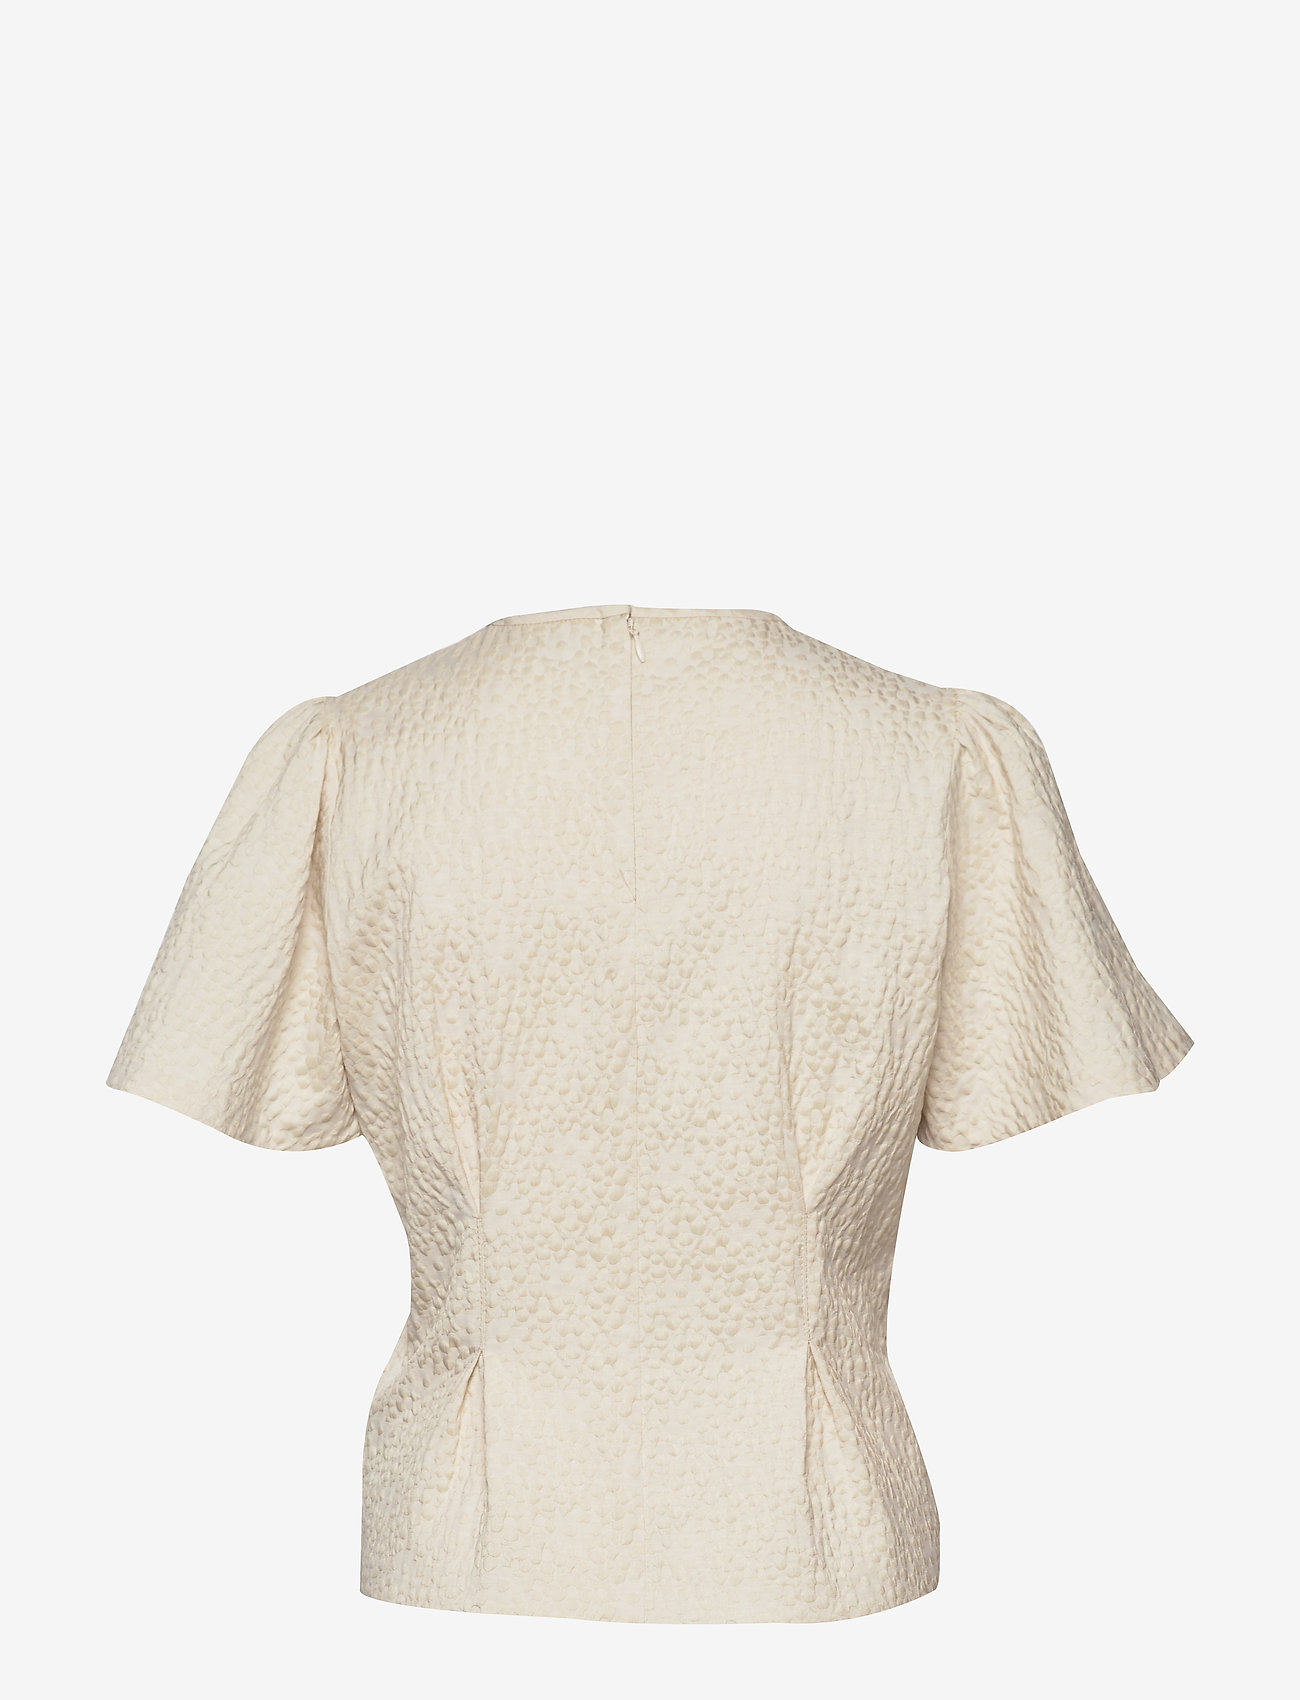 Samsøe Samsøe - Jo ss blouse 11402 - blouses à manches courtes - white flower - 1